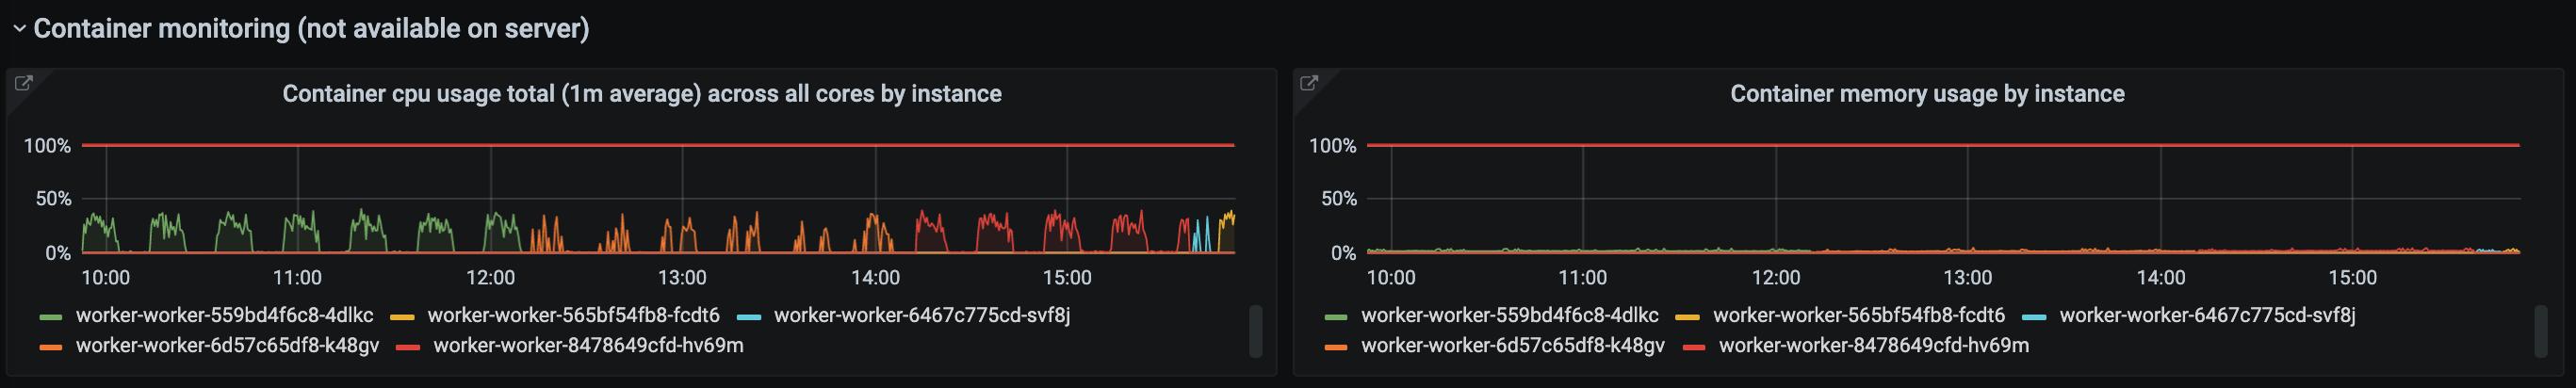 Worker resource usage panels (multiple instances)